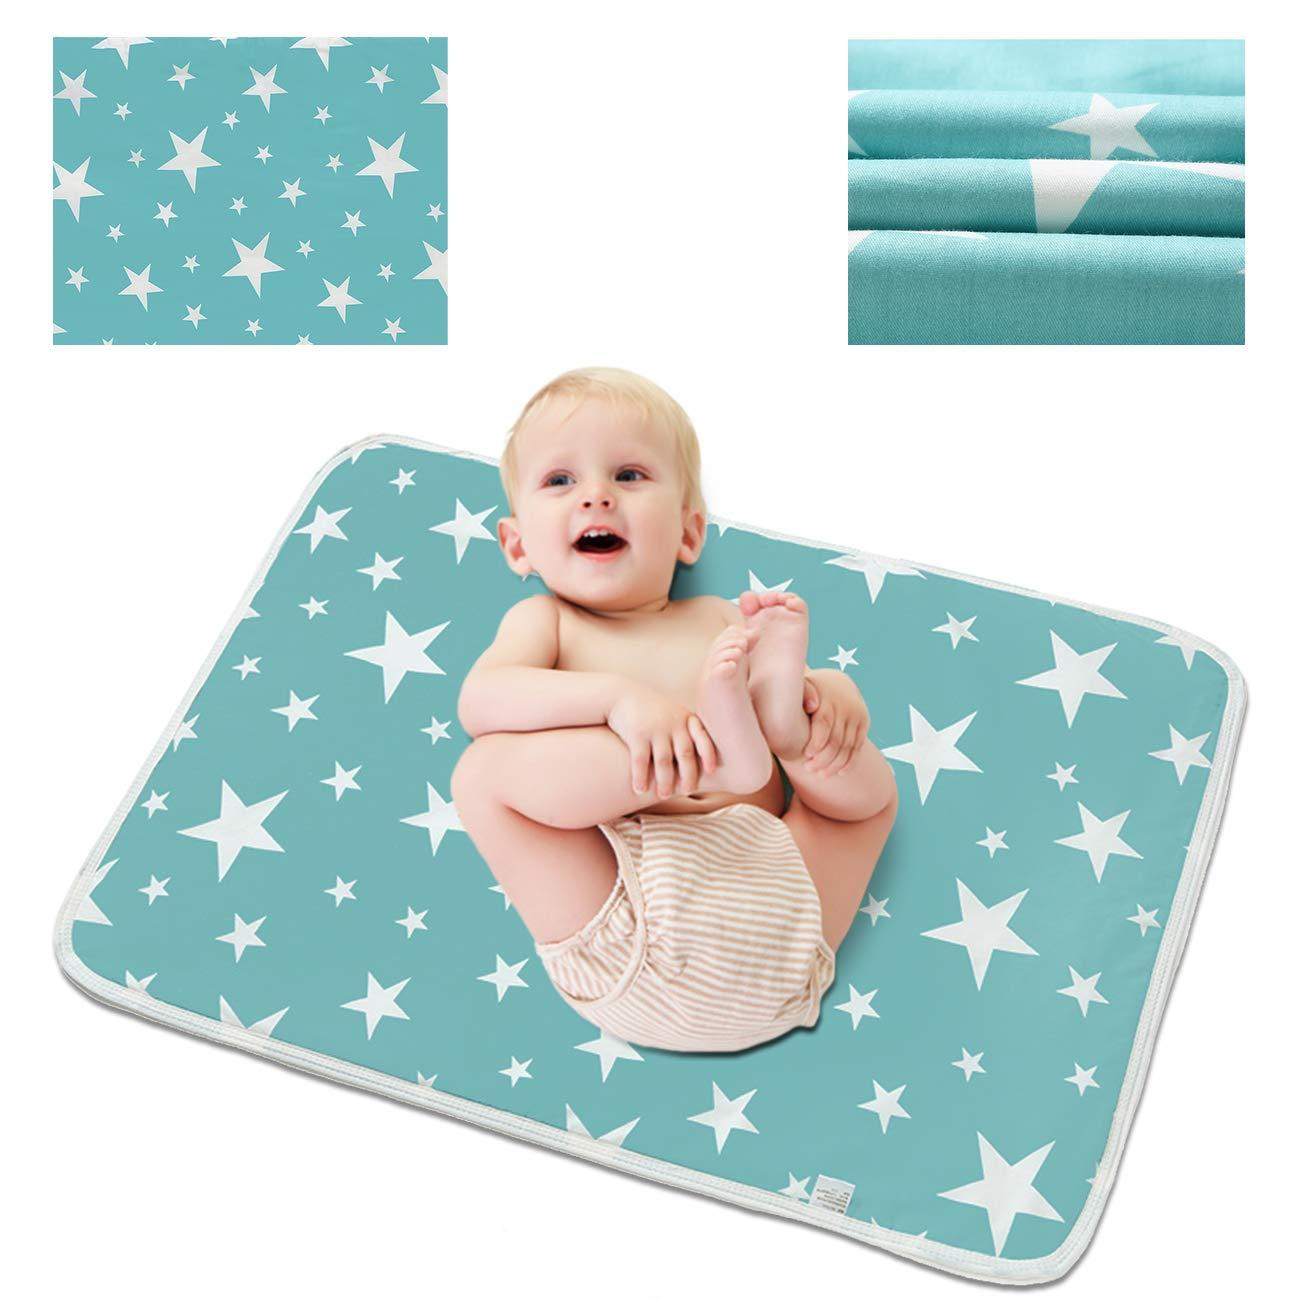 Waterproof Changing mat Star Changing Pad Star Changing mat Baby Changing mat Travel Changing mat